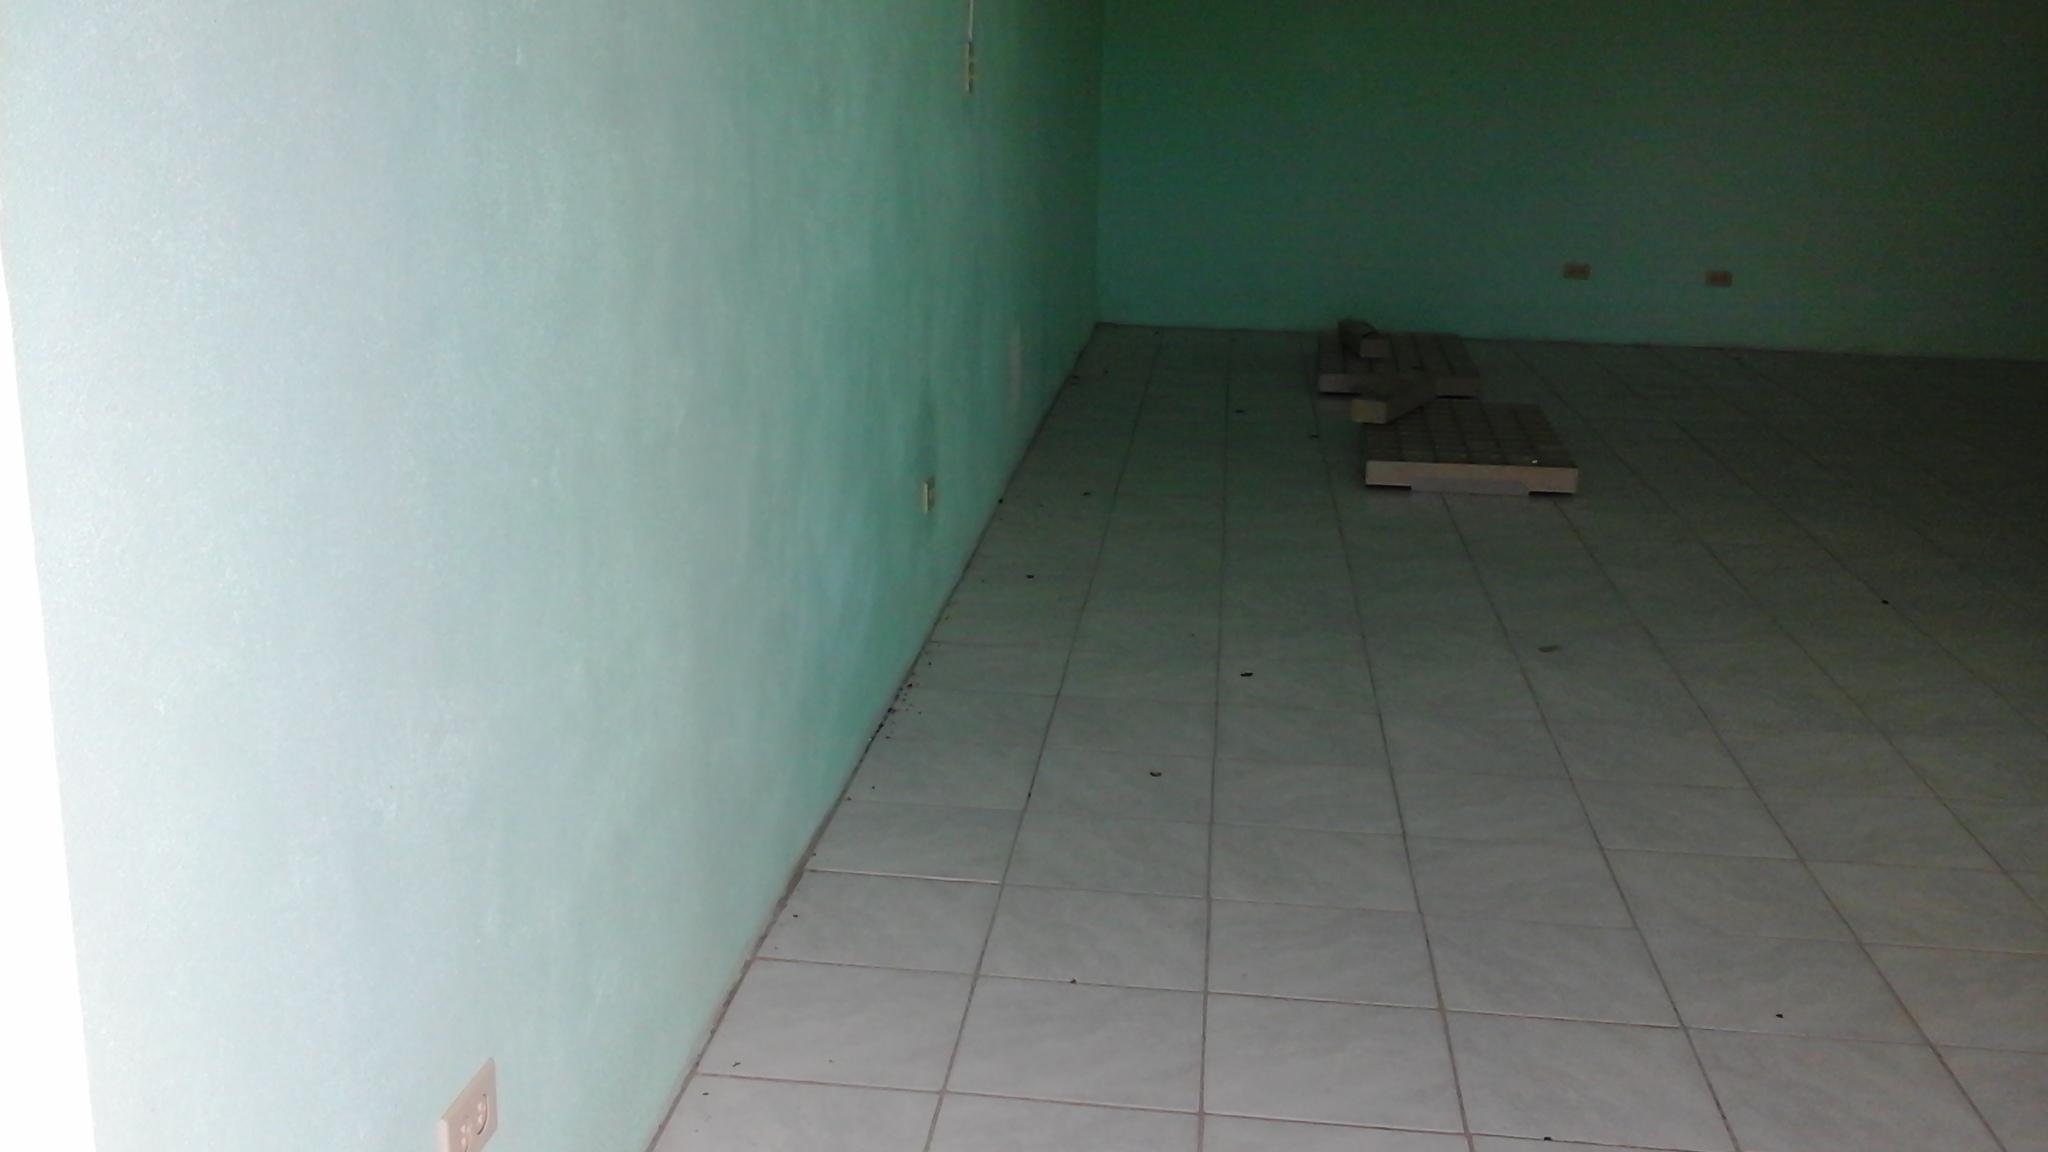 Apt 2 floor area